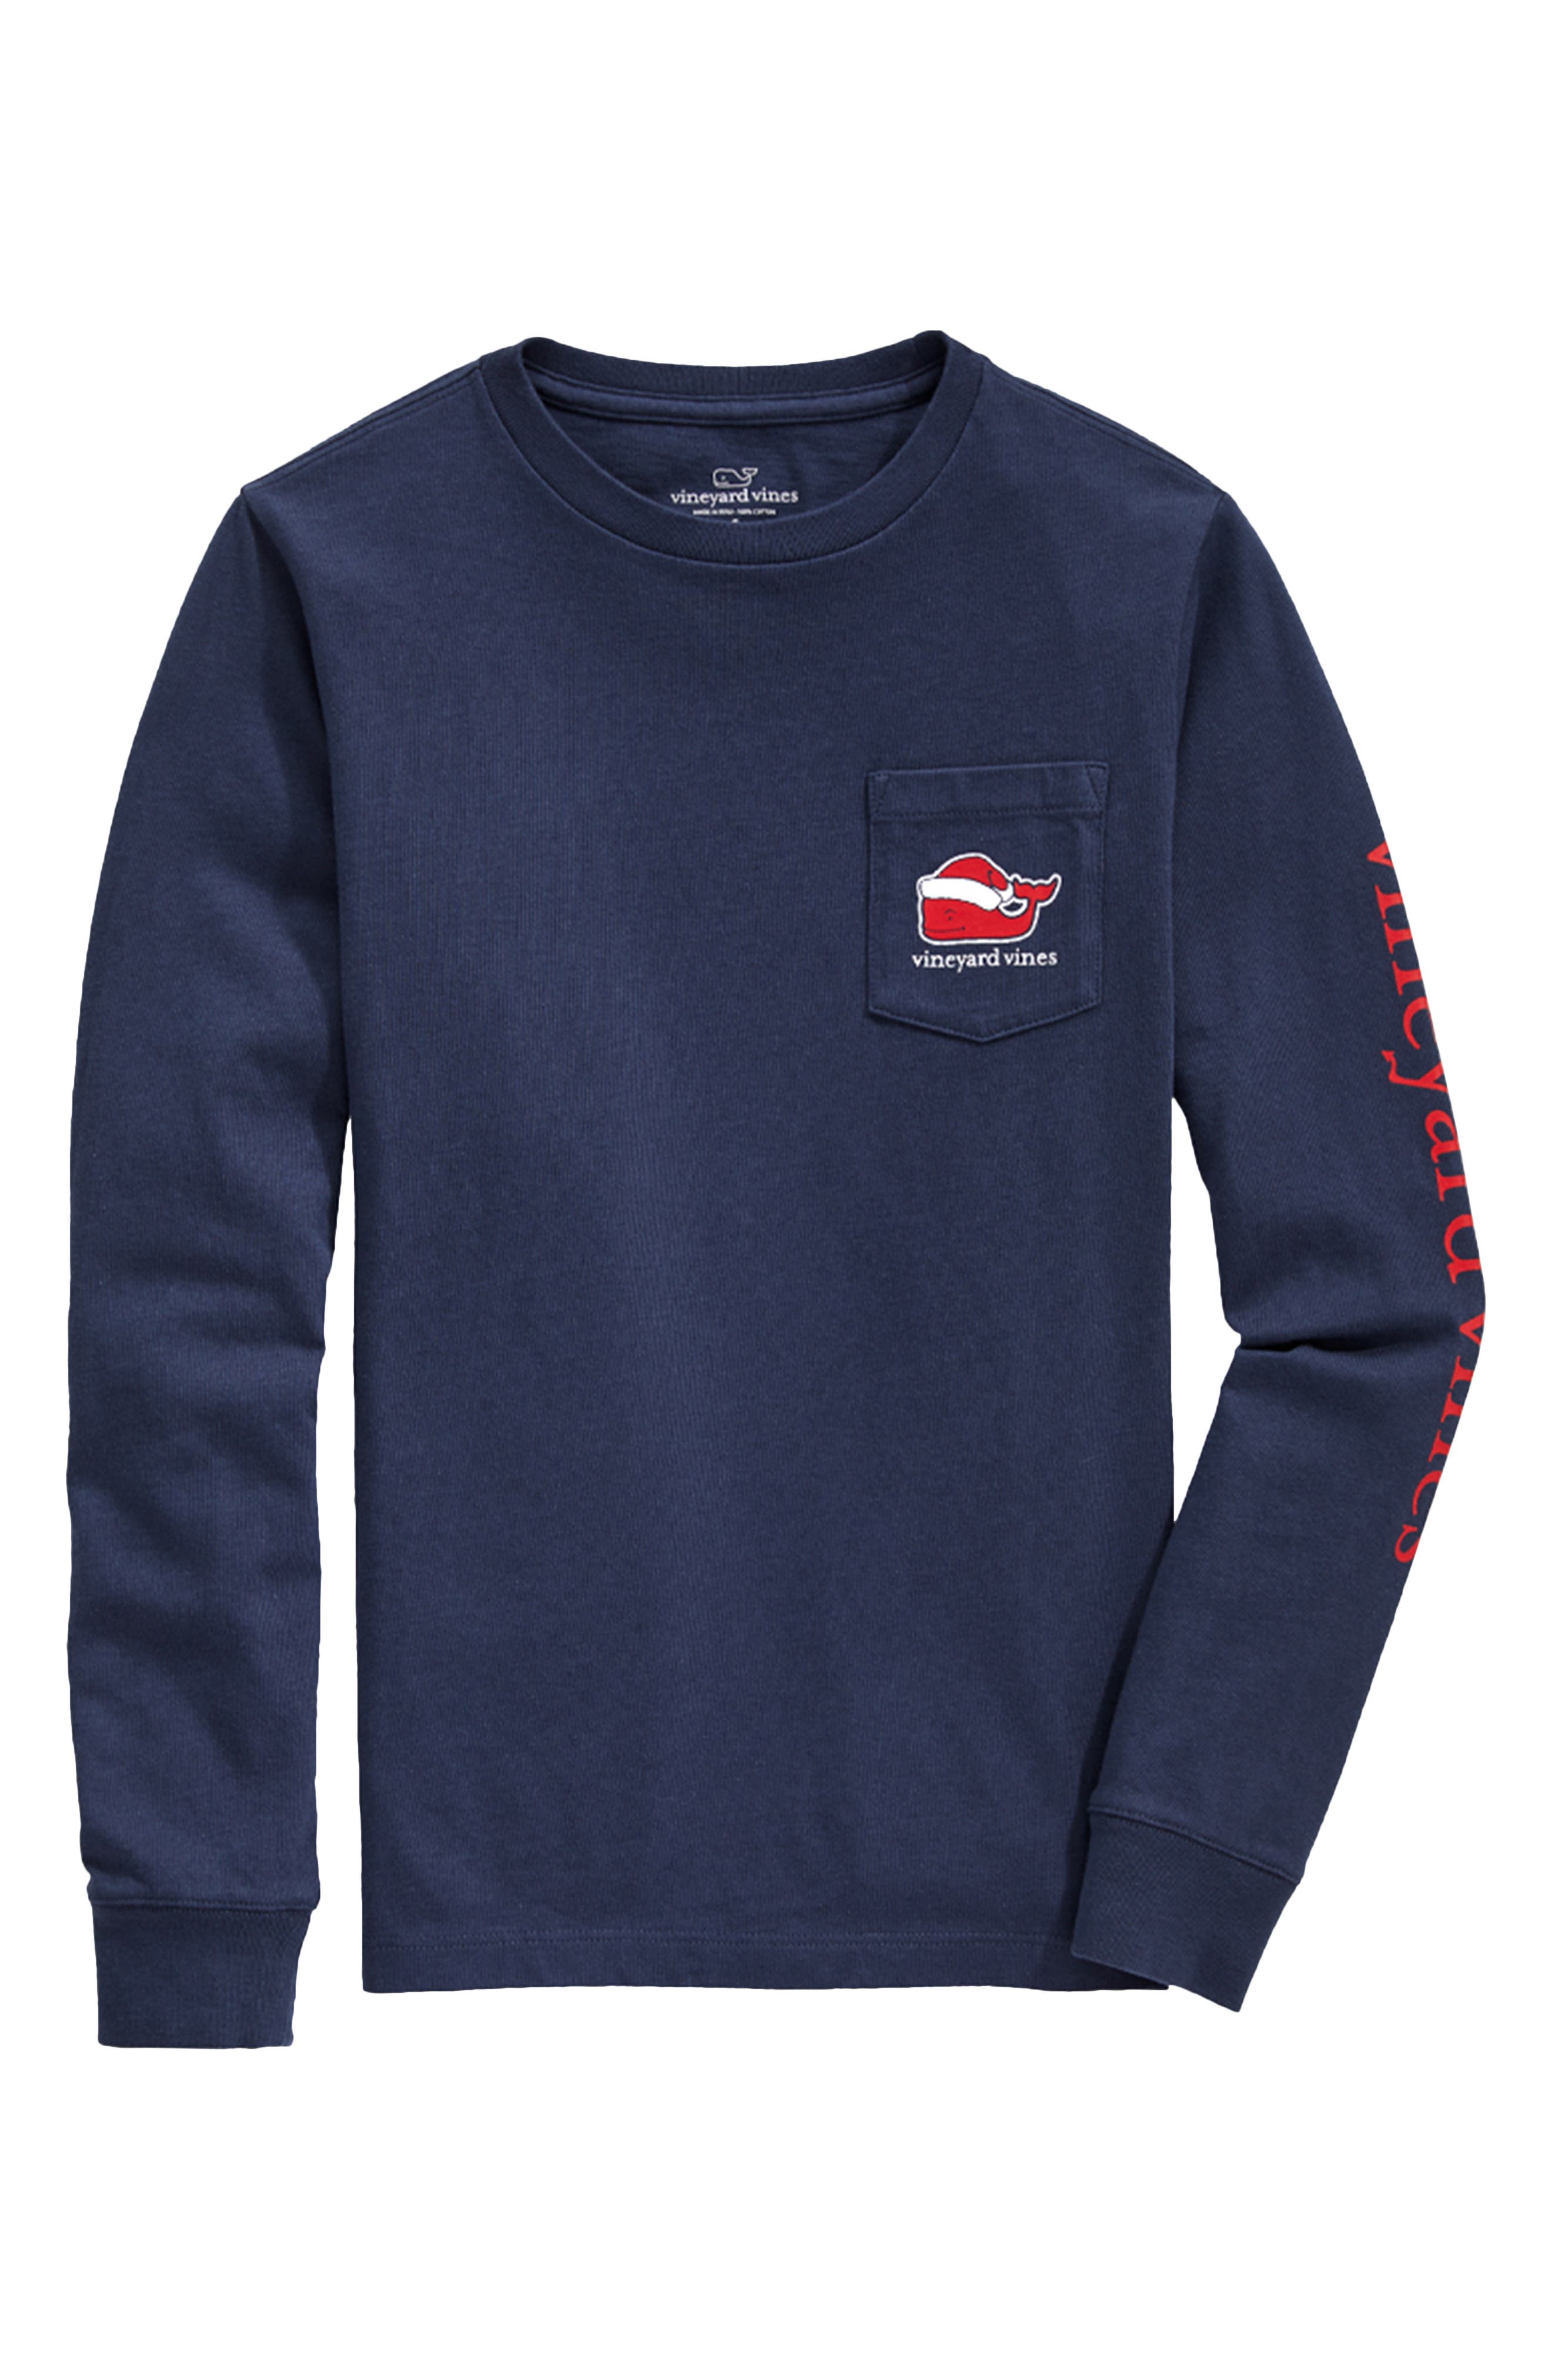 Bear 400 Blue Size:2T Hatley Baby Boys Long Sleeve Tees Longsleeve T-Shirt 2 Years